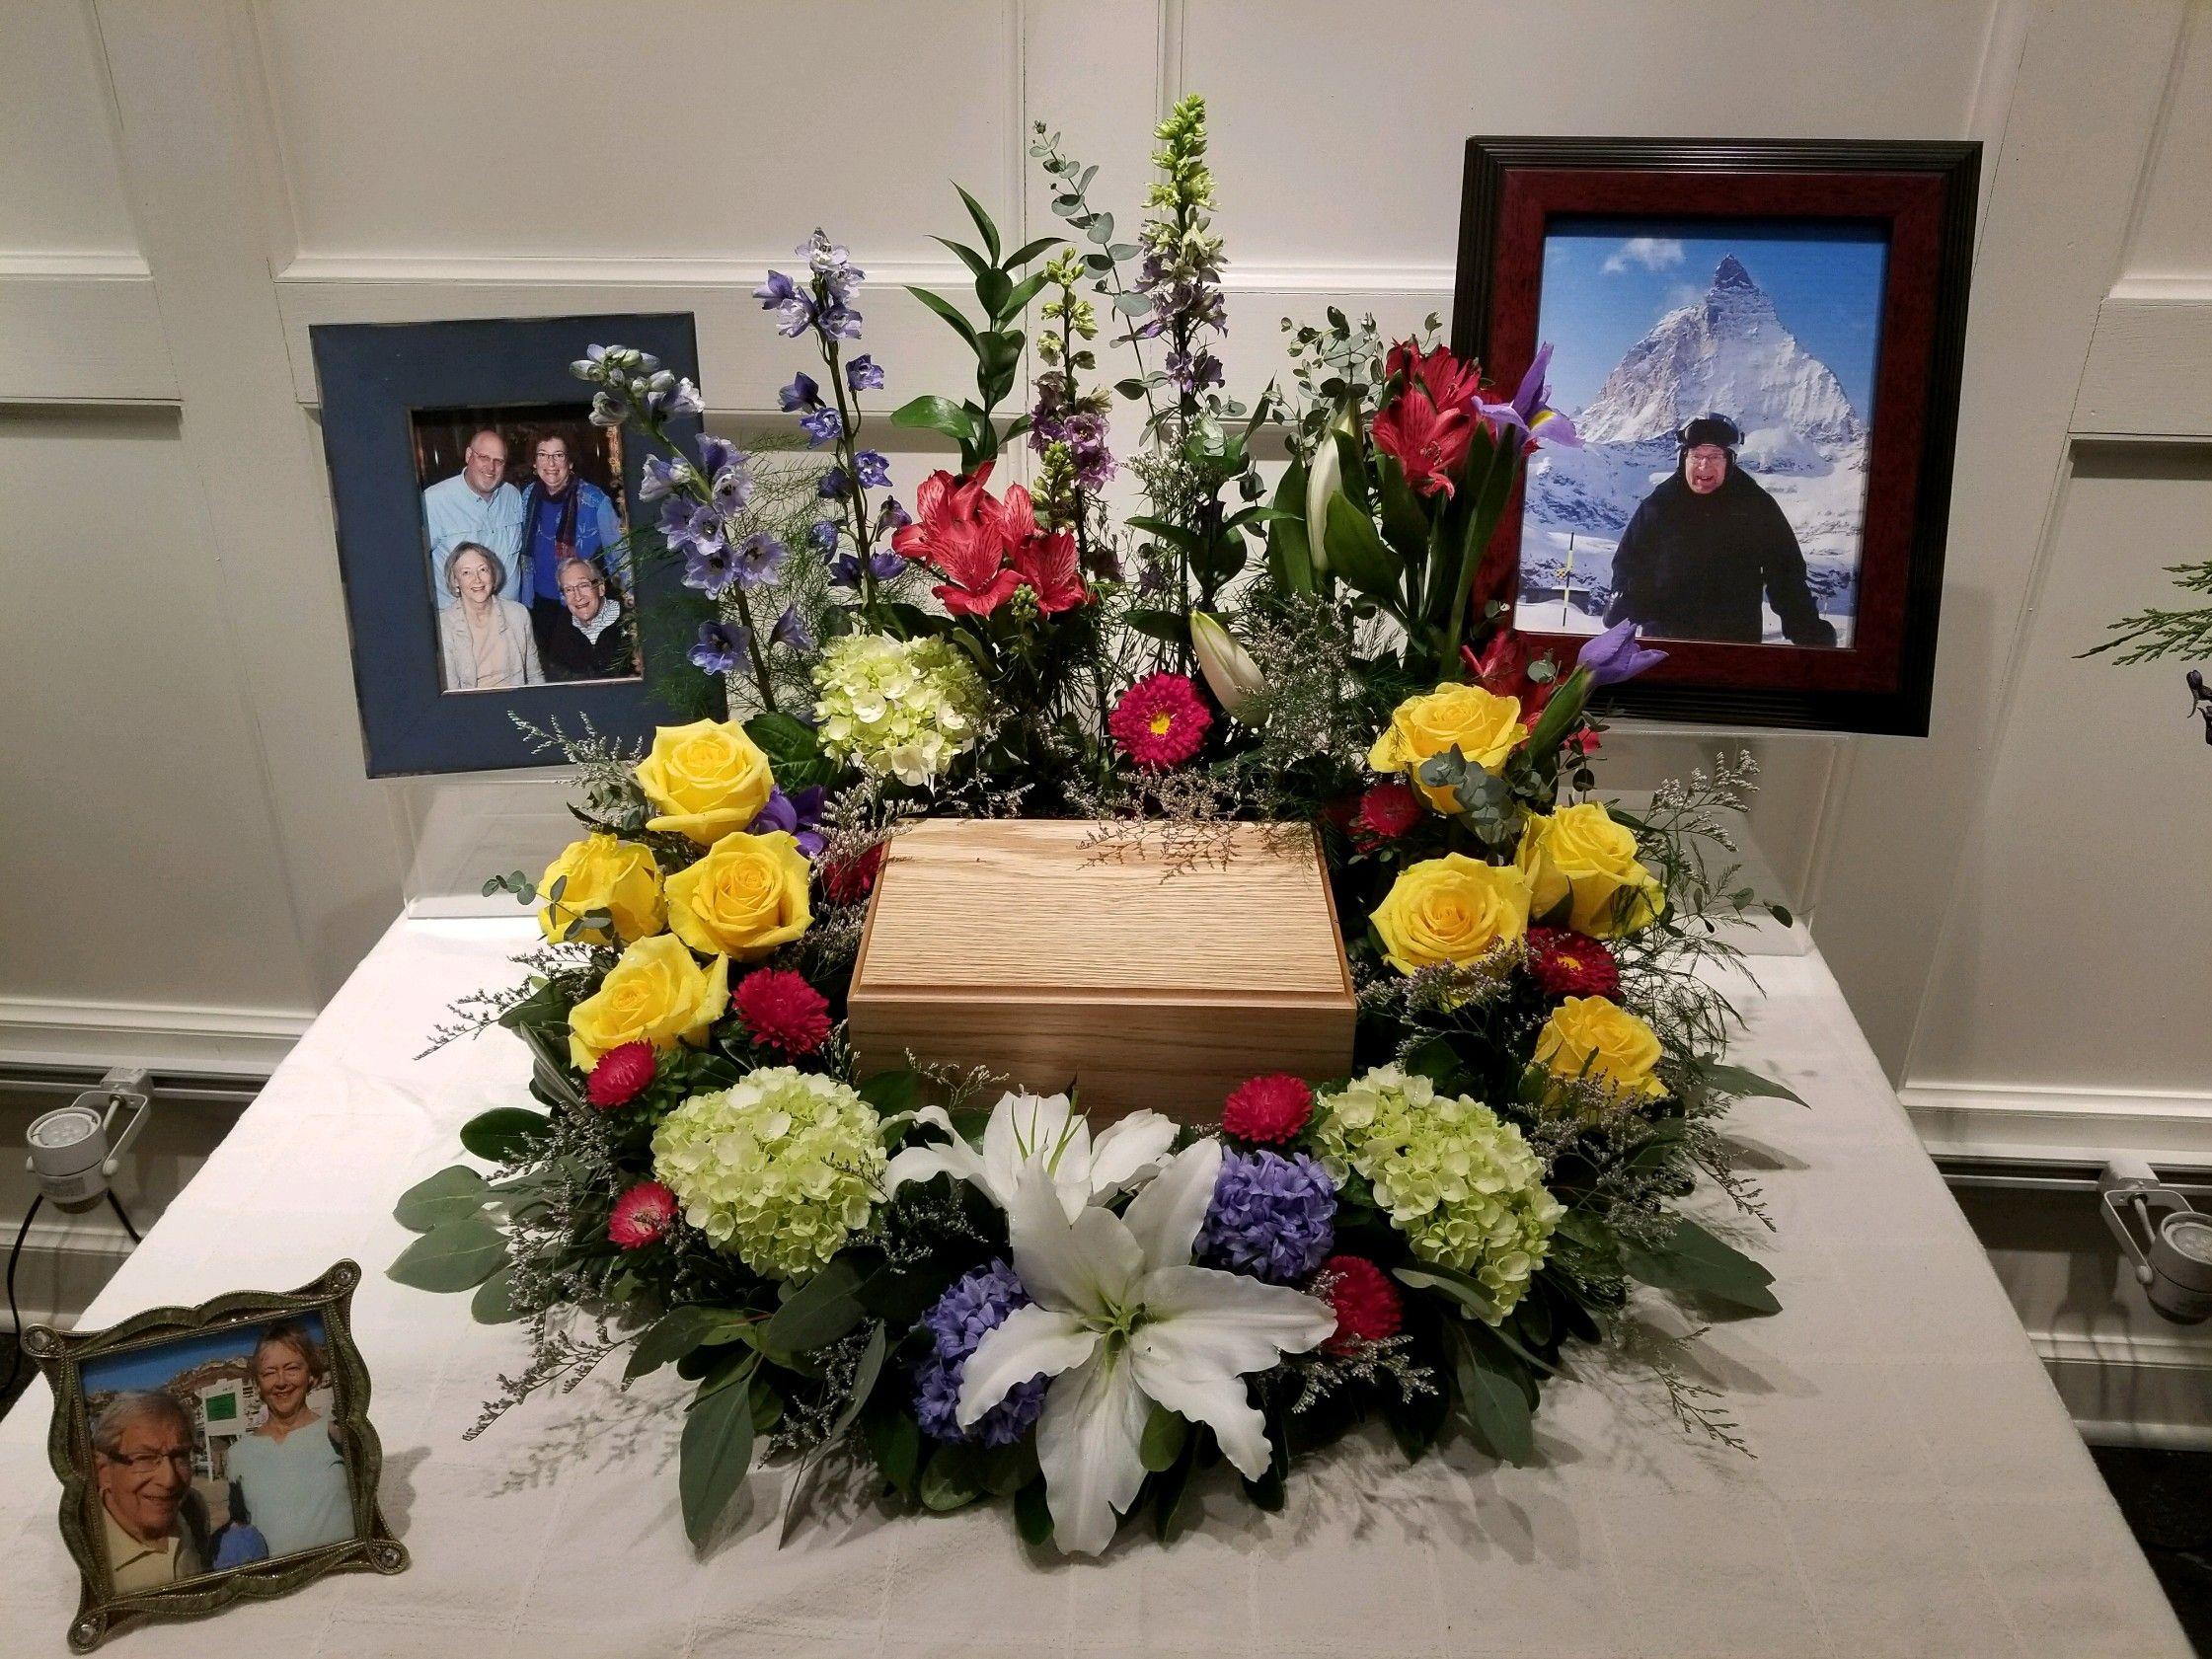 Wreath For Cremation Urn Funeral Urn Arrangements Funeral